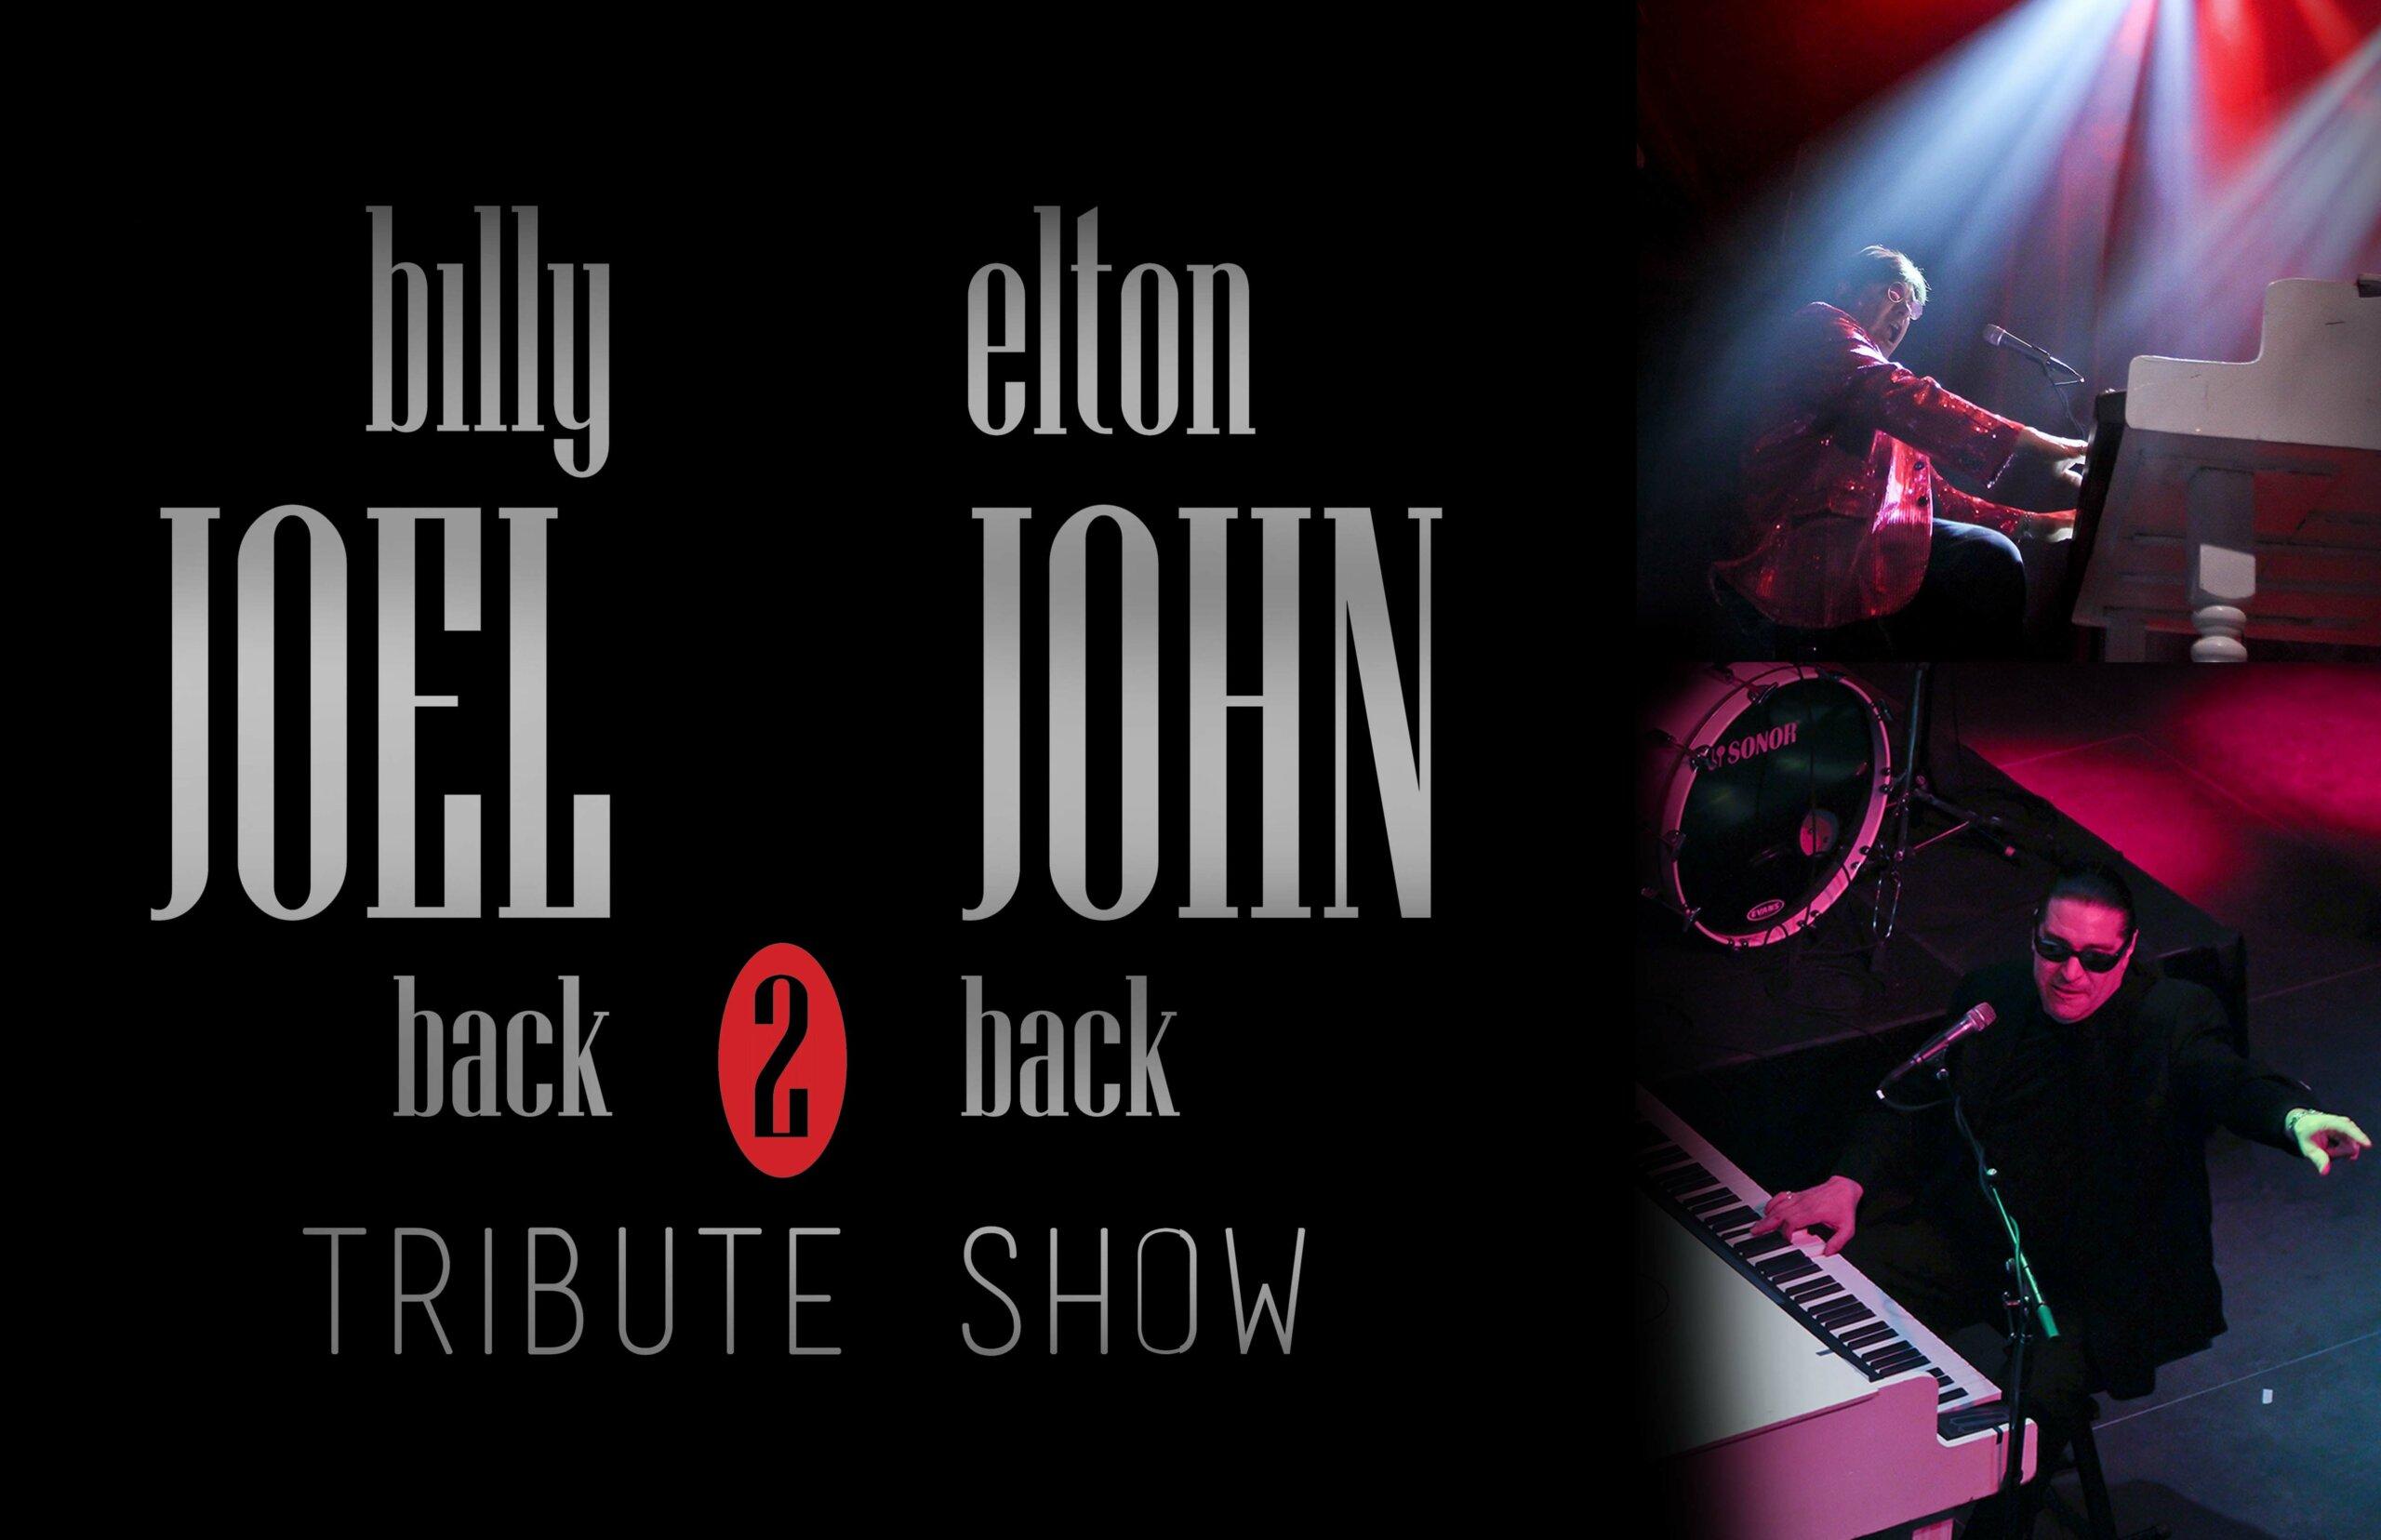 Billy Joel & Elton John back-to-back Tribute Show